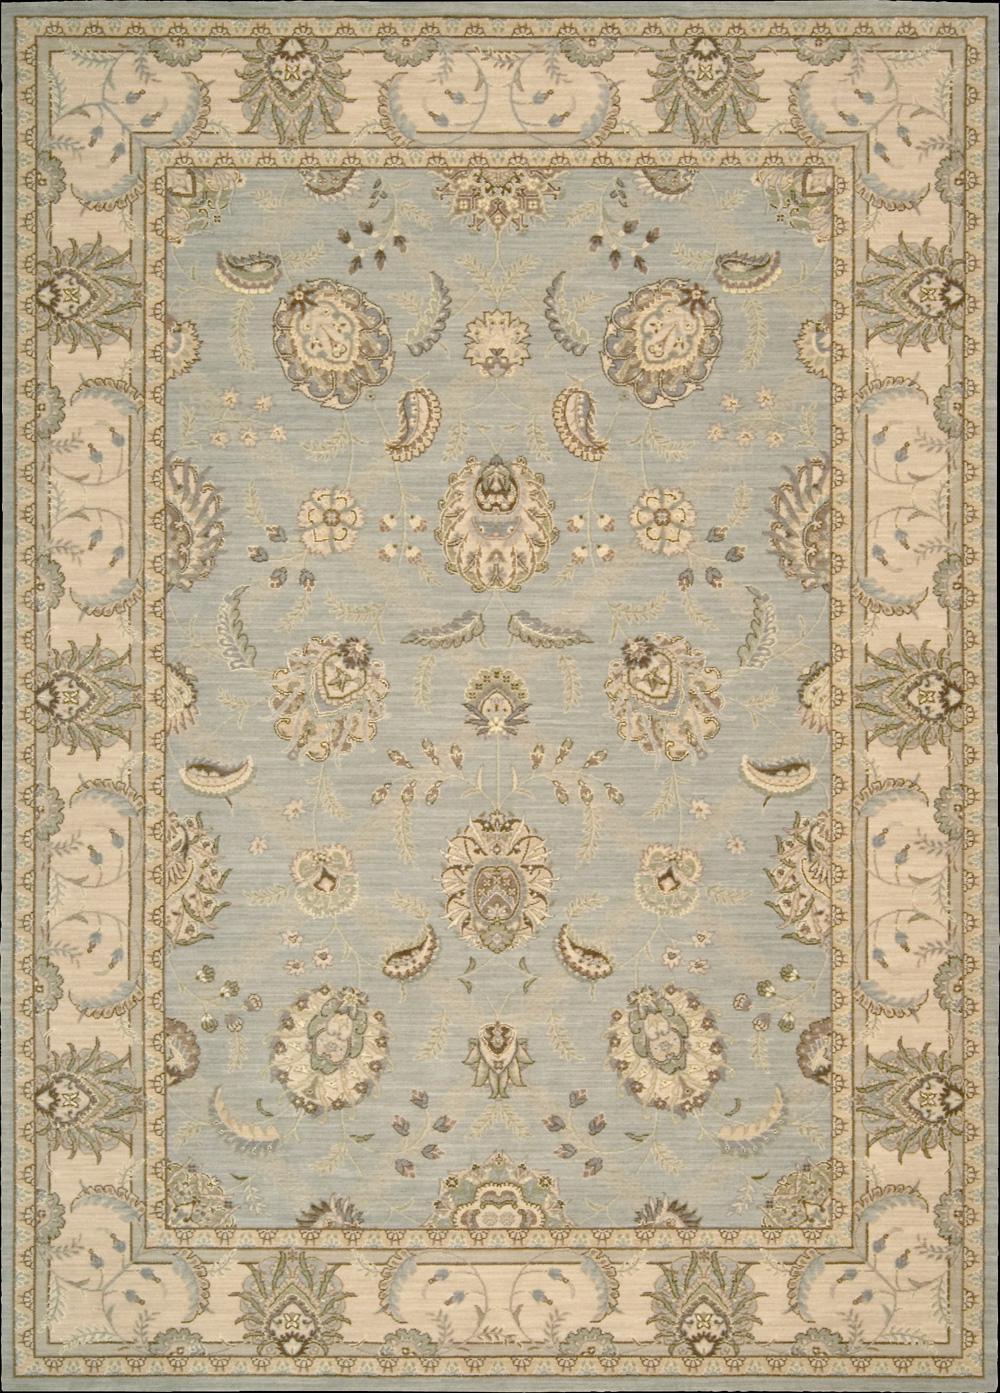 Nourison Persian Empire Area Rug 12' x 15' - Item Number: 25761